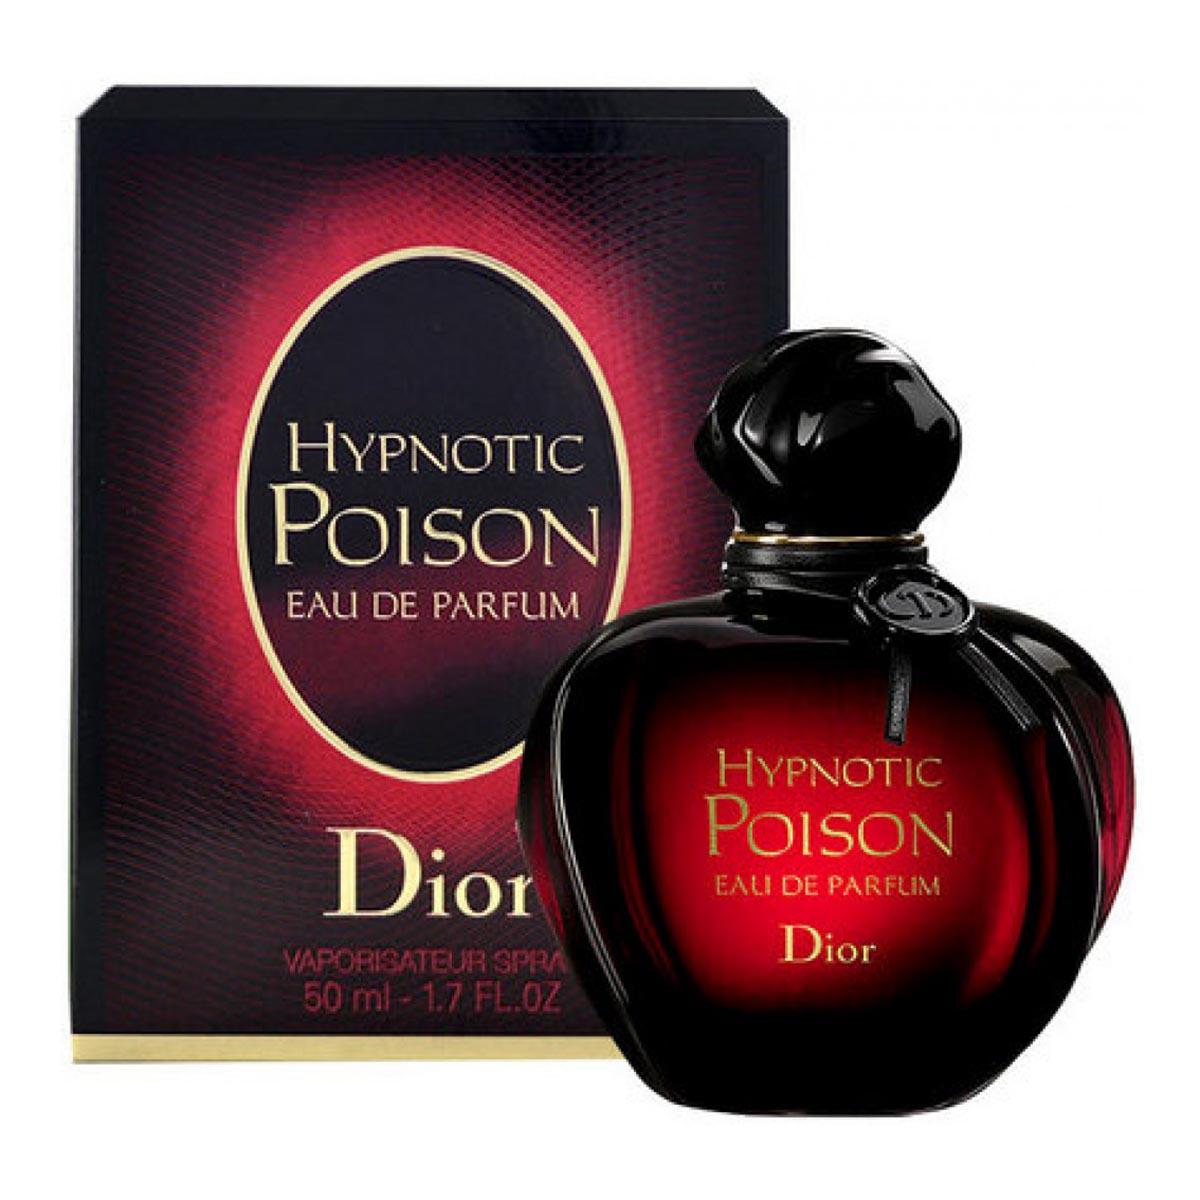 Dior hypnotic poison eau de parfum 50ml vaporizador